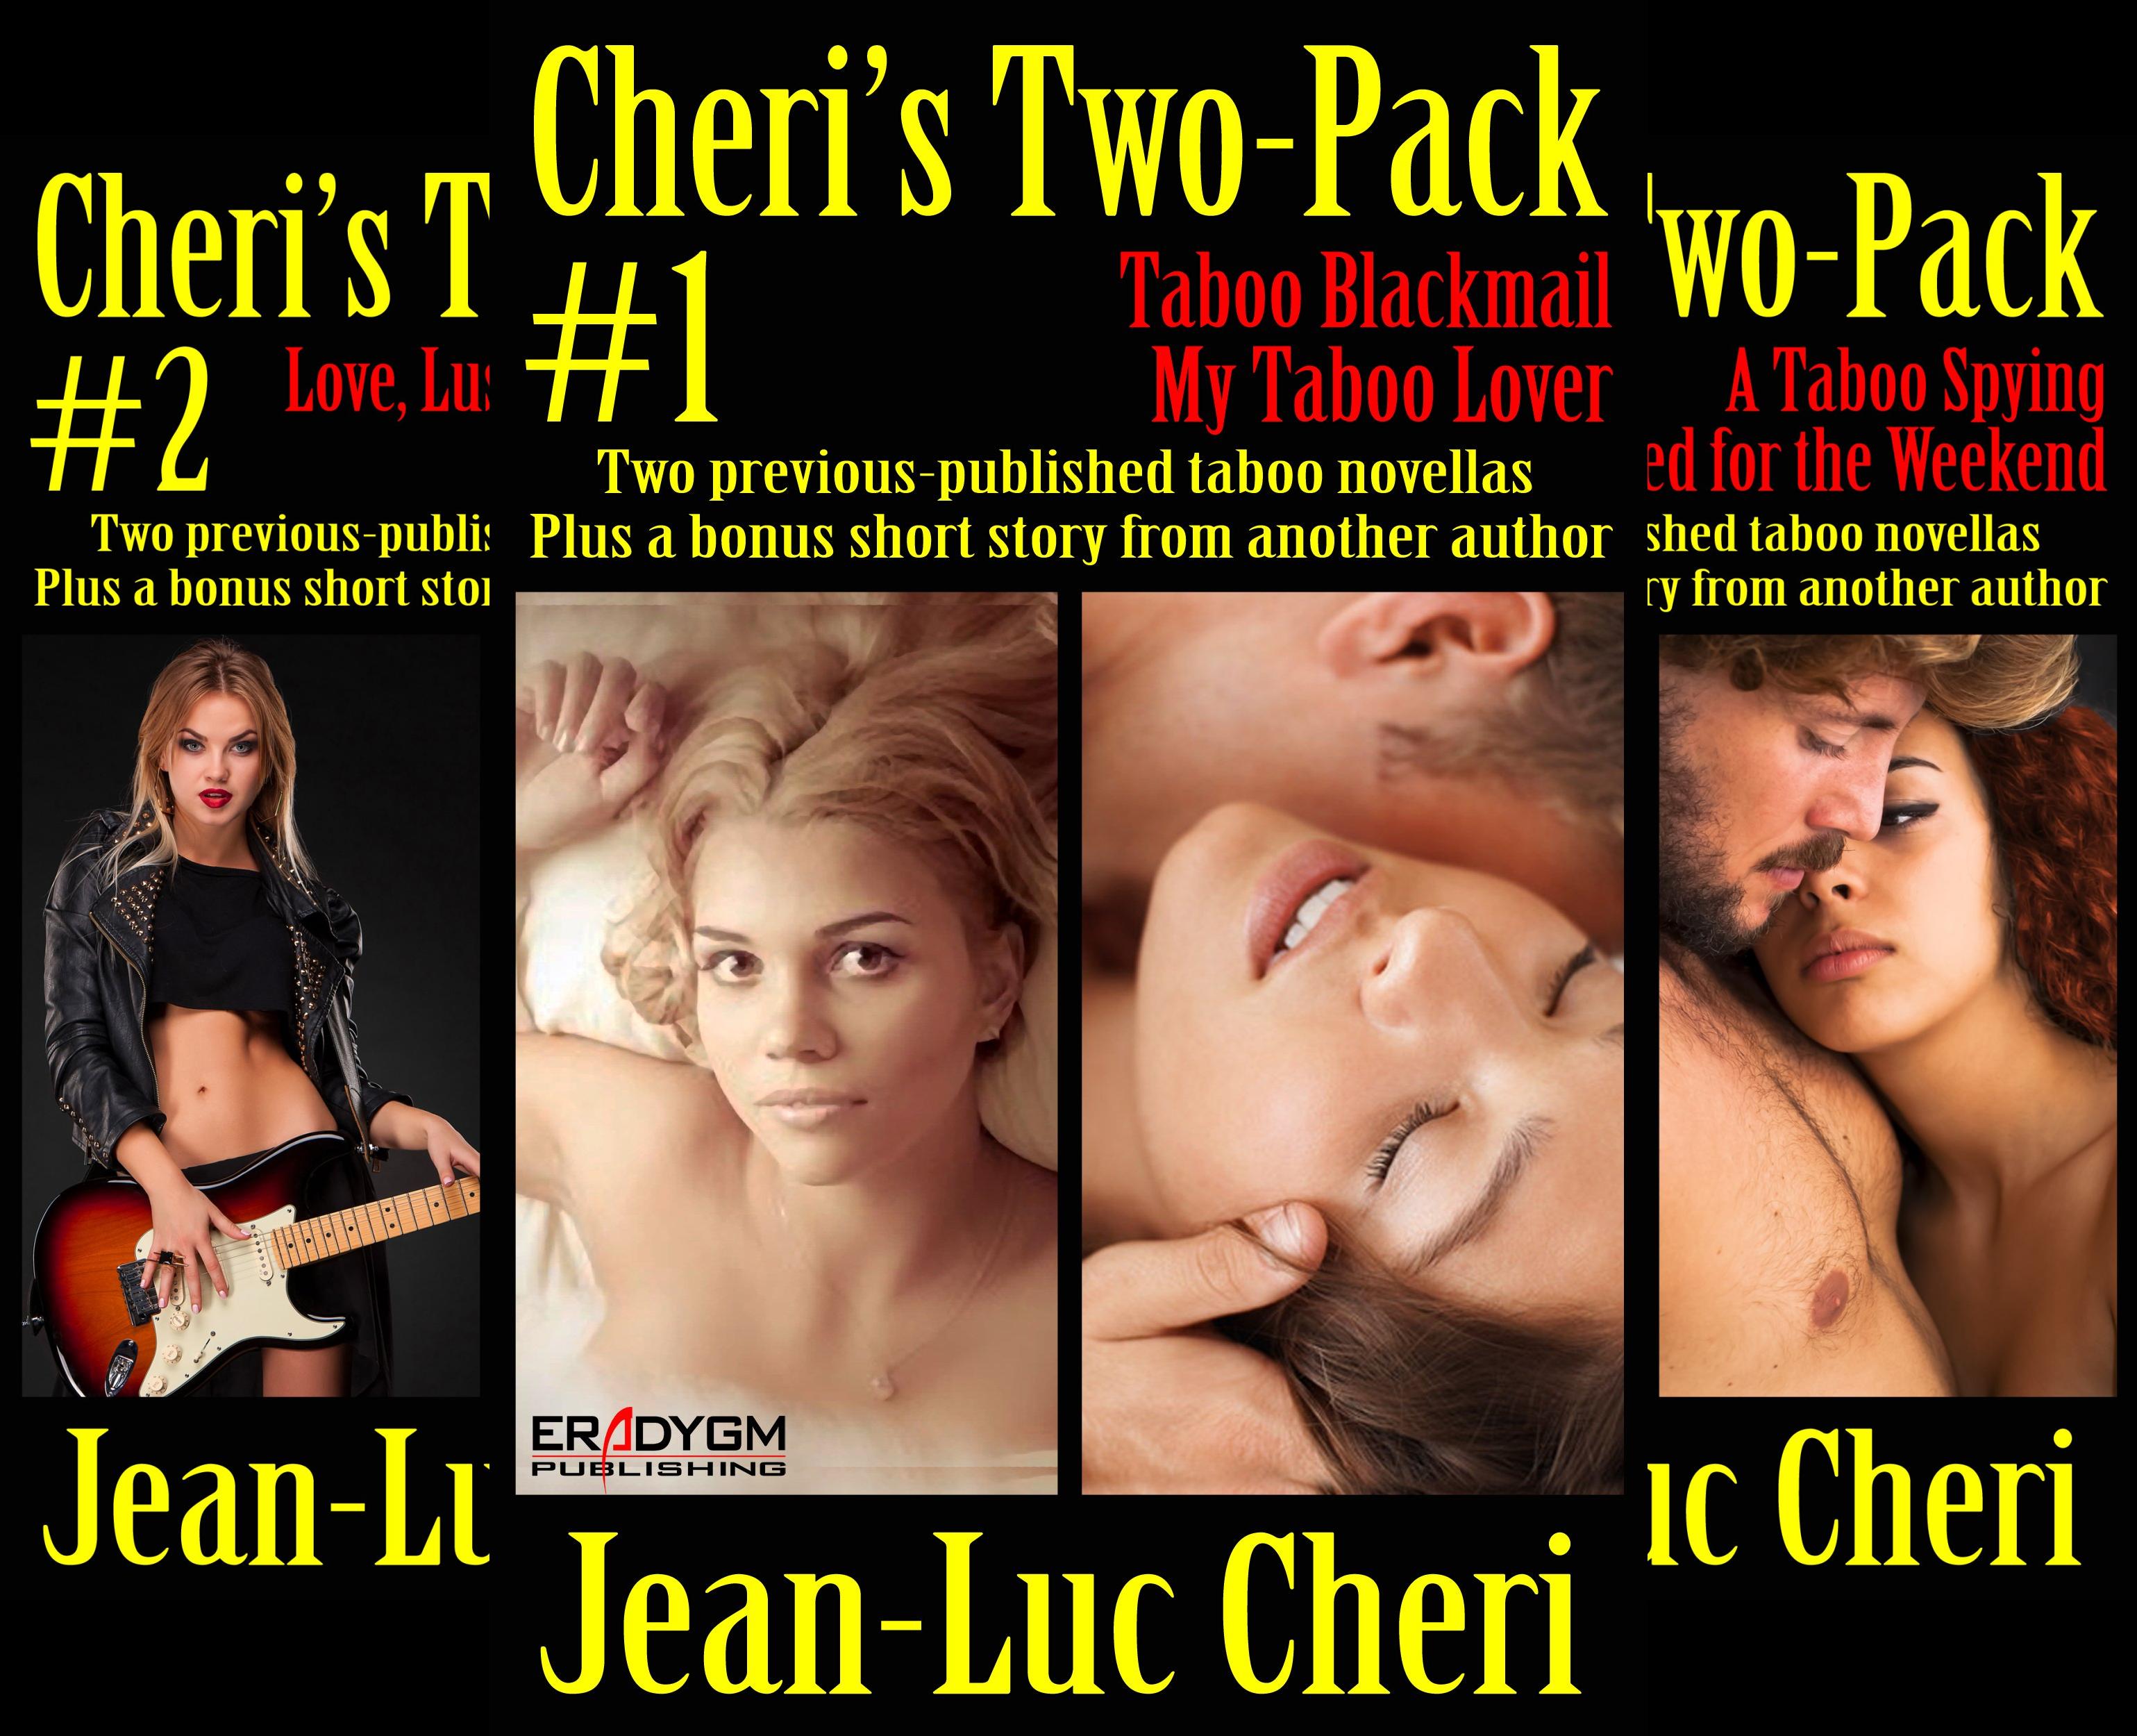 Cheri's Two-Packs (4 Book Series)